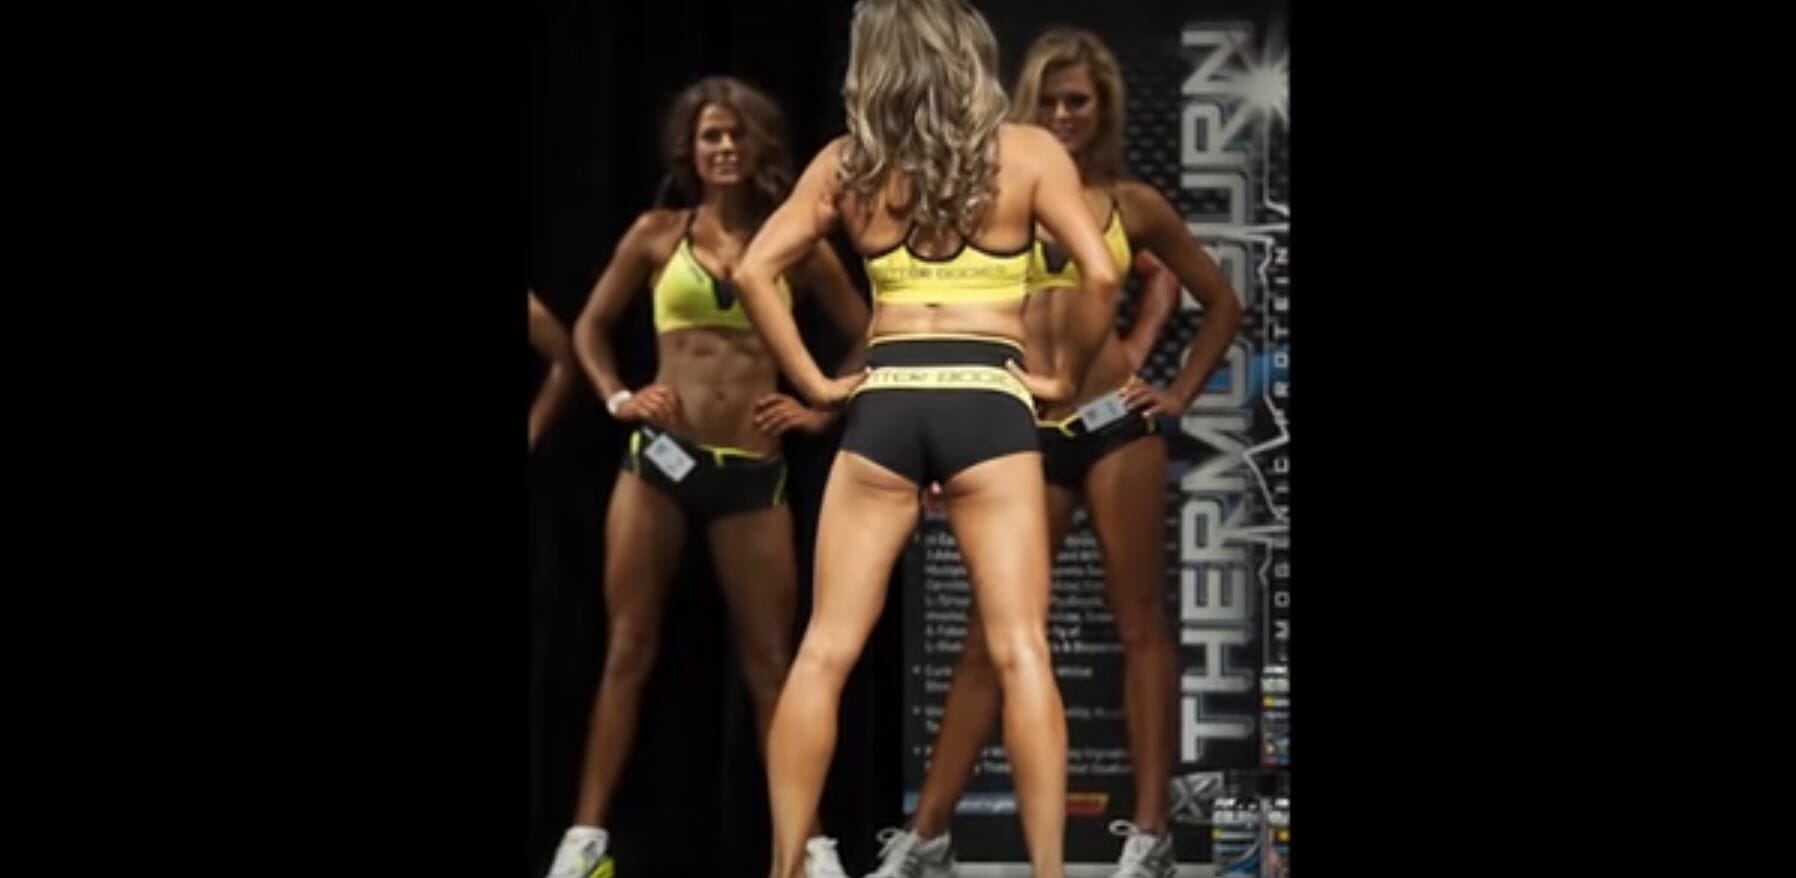 taryn brumfitt bodybuilding